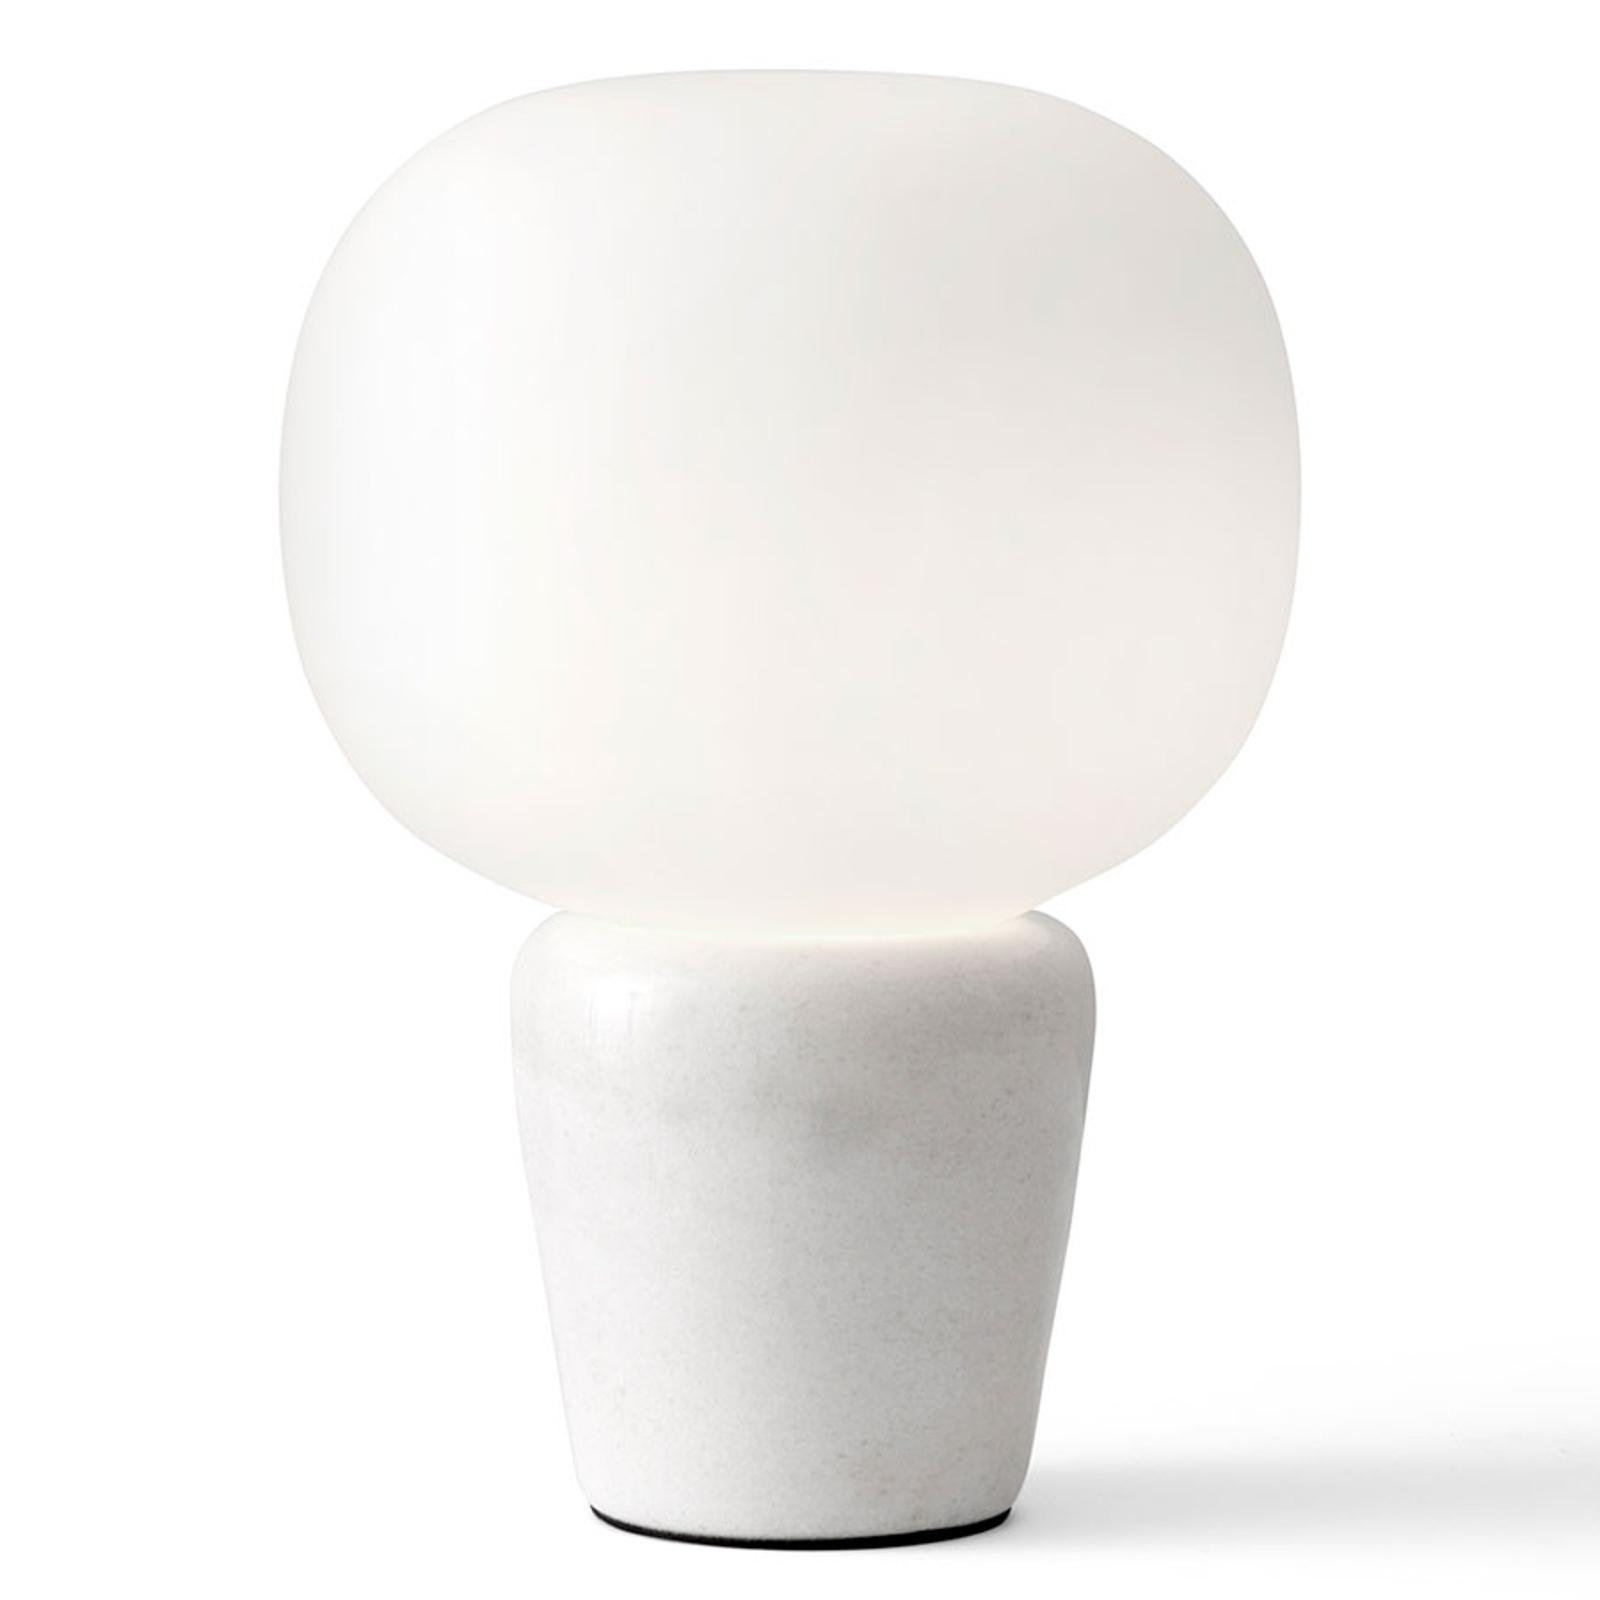 Bombo-pöytävalo, marmoria, korkeus 27cm, Ø 19cm